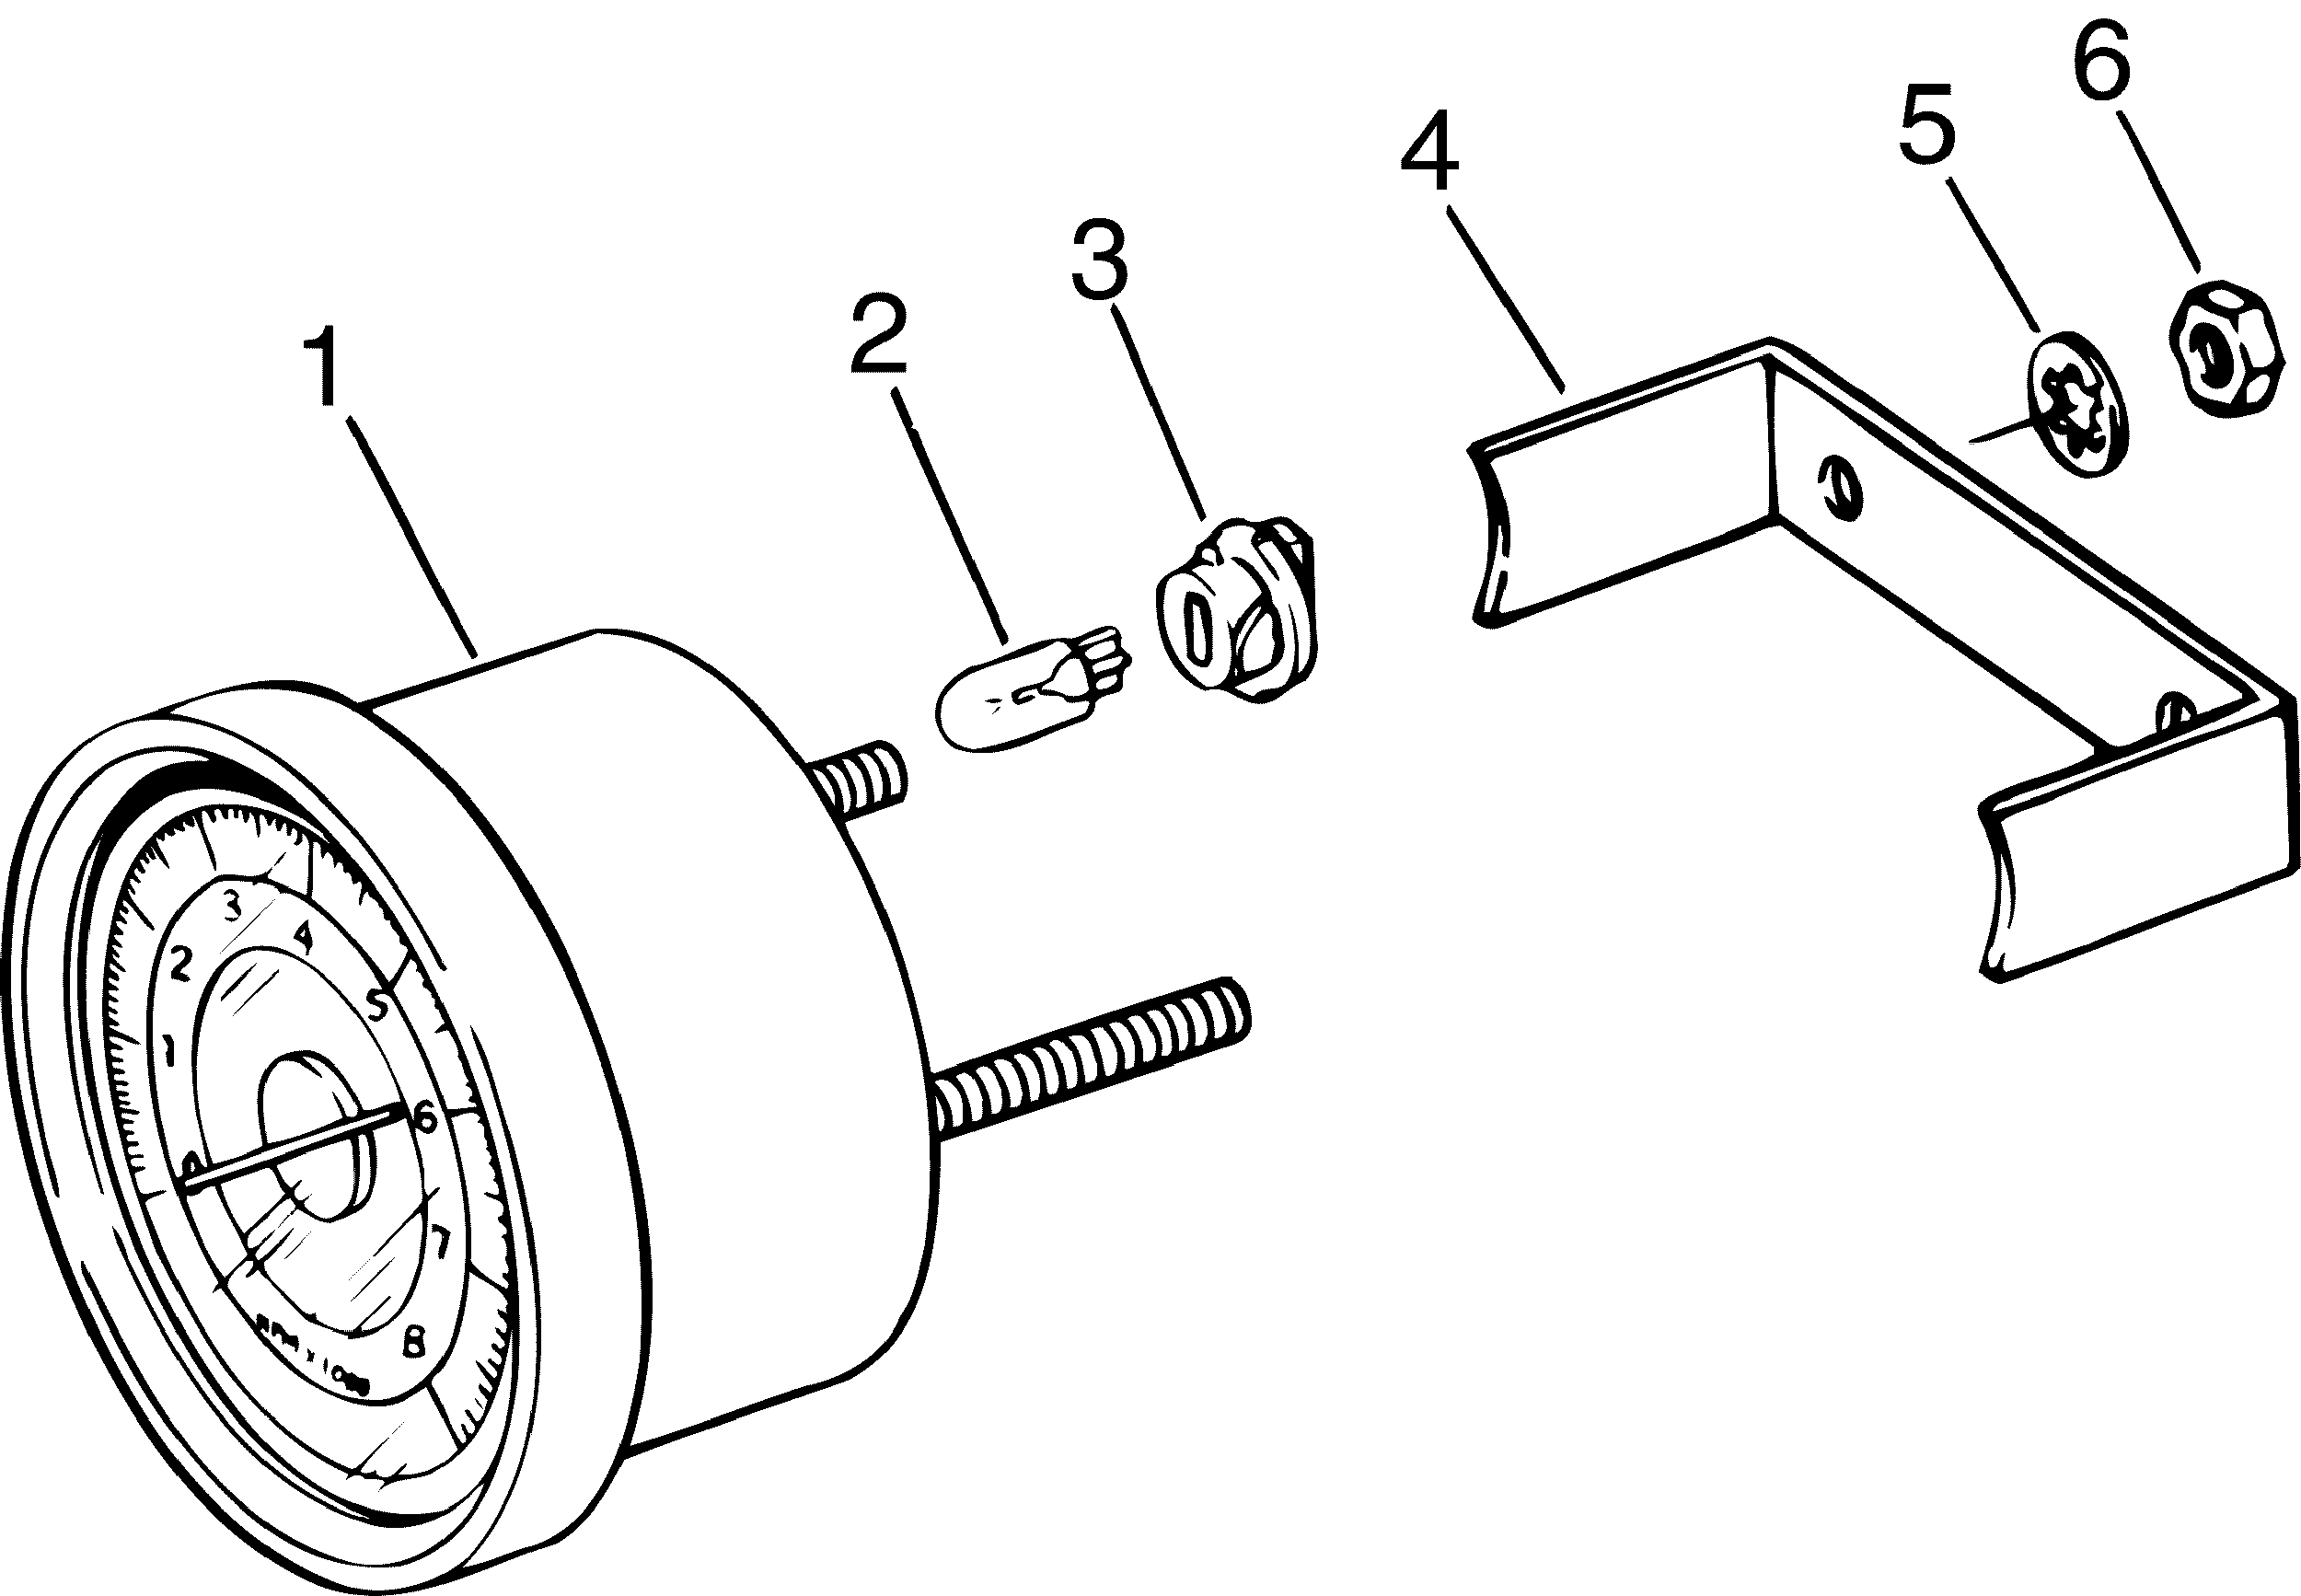 64064?resize\\\\\\\=665%2C461\\\\\\\&ssl\\\\\\\=1 sunpro tachometer wiring diagram & sunpro tach to hei wiring Auto Meter Fuel Gauge Wiring Diagram at reclaimingppi.co